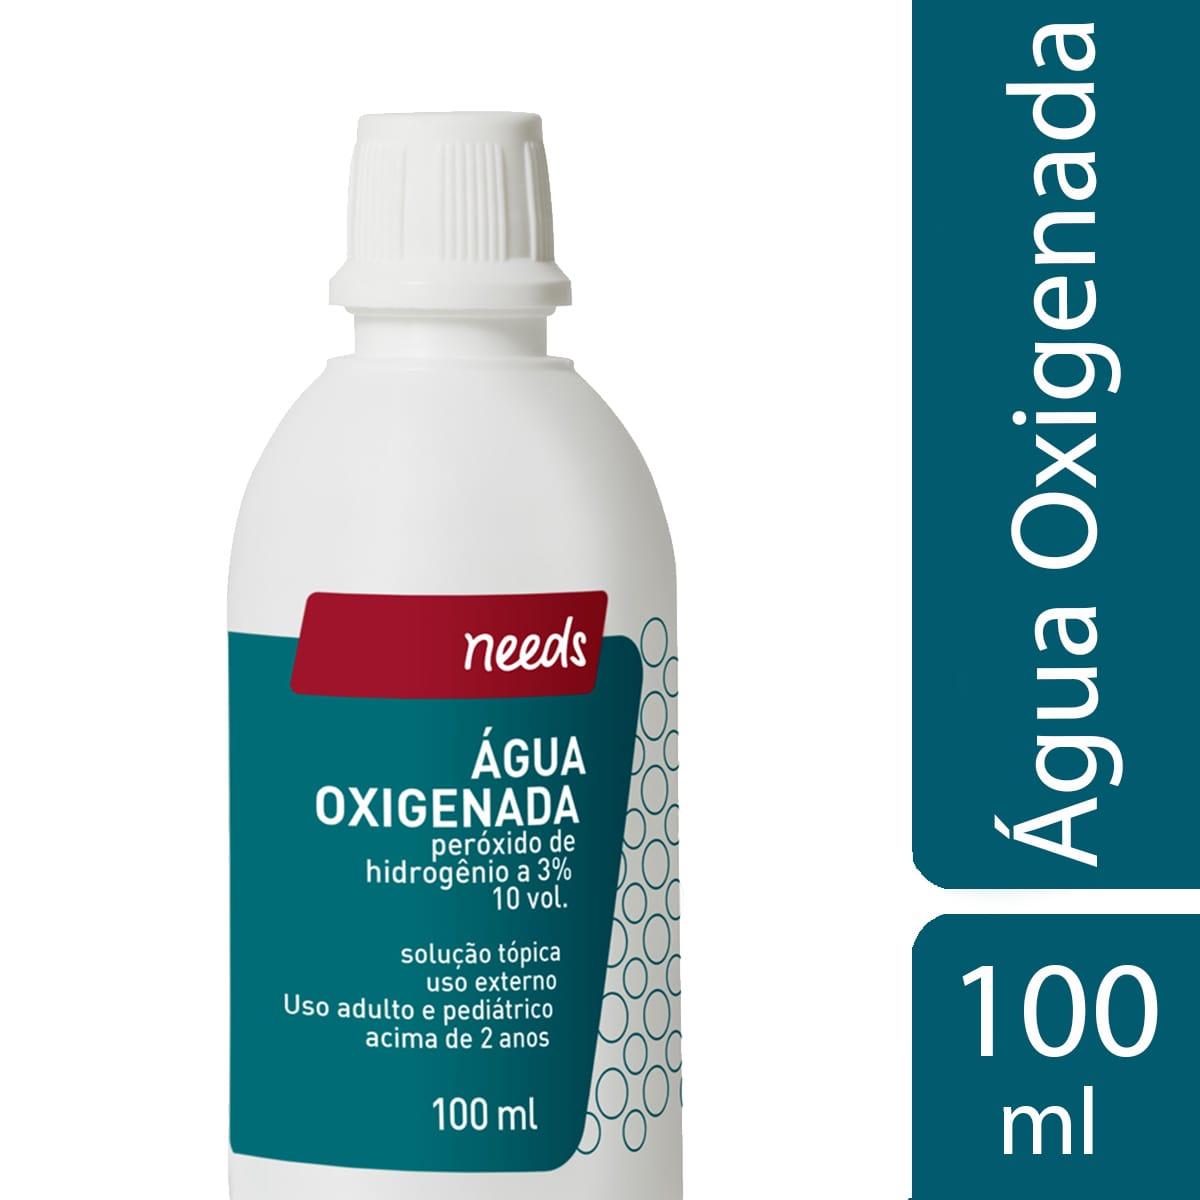 Agua Oxigenada 10 Volumes Needs Droga Raia